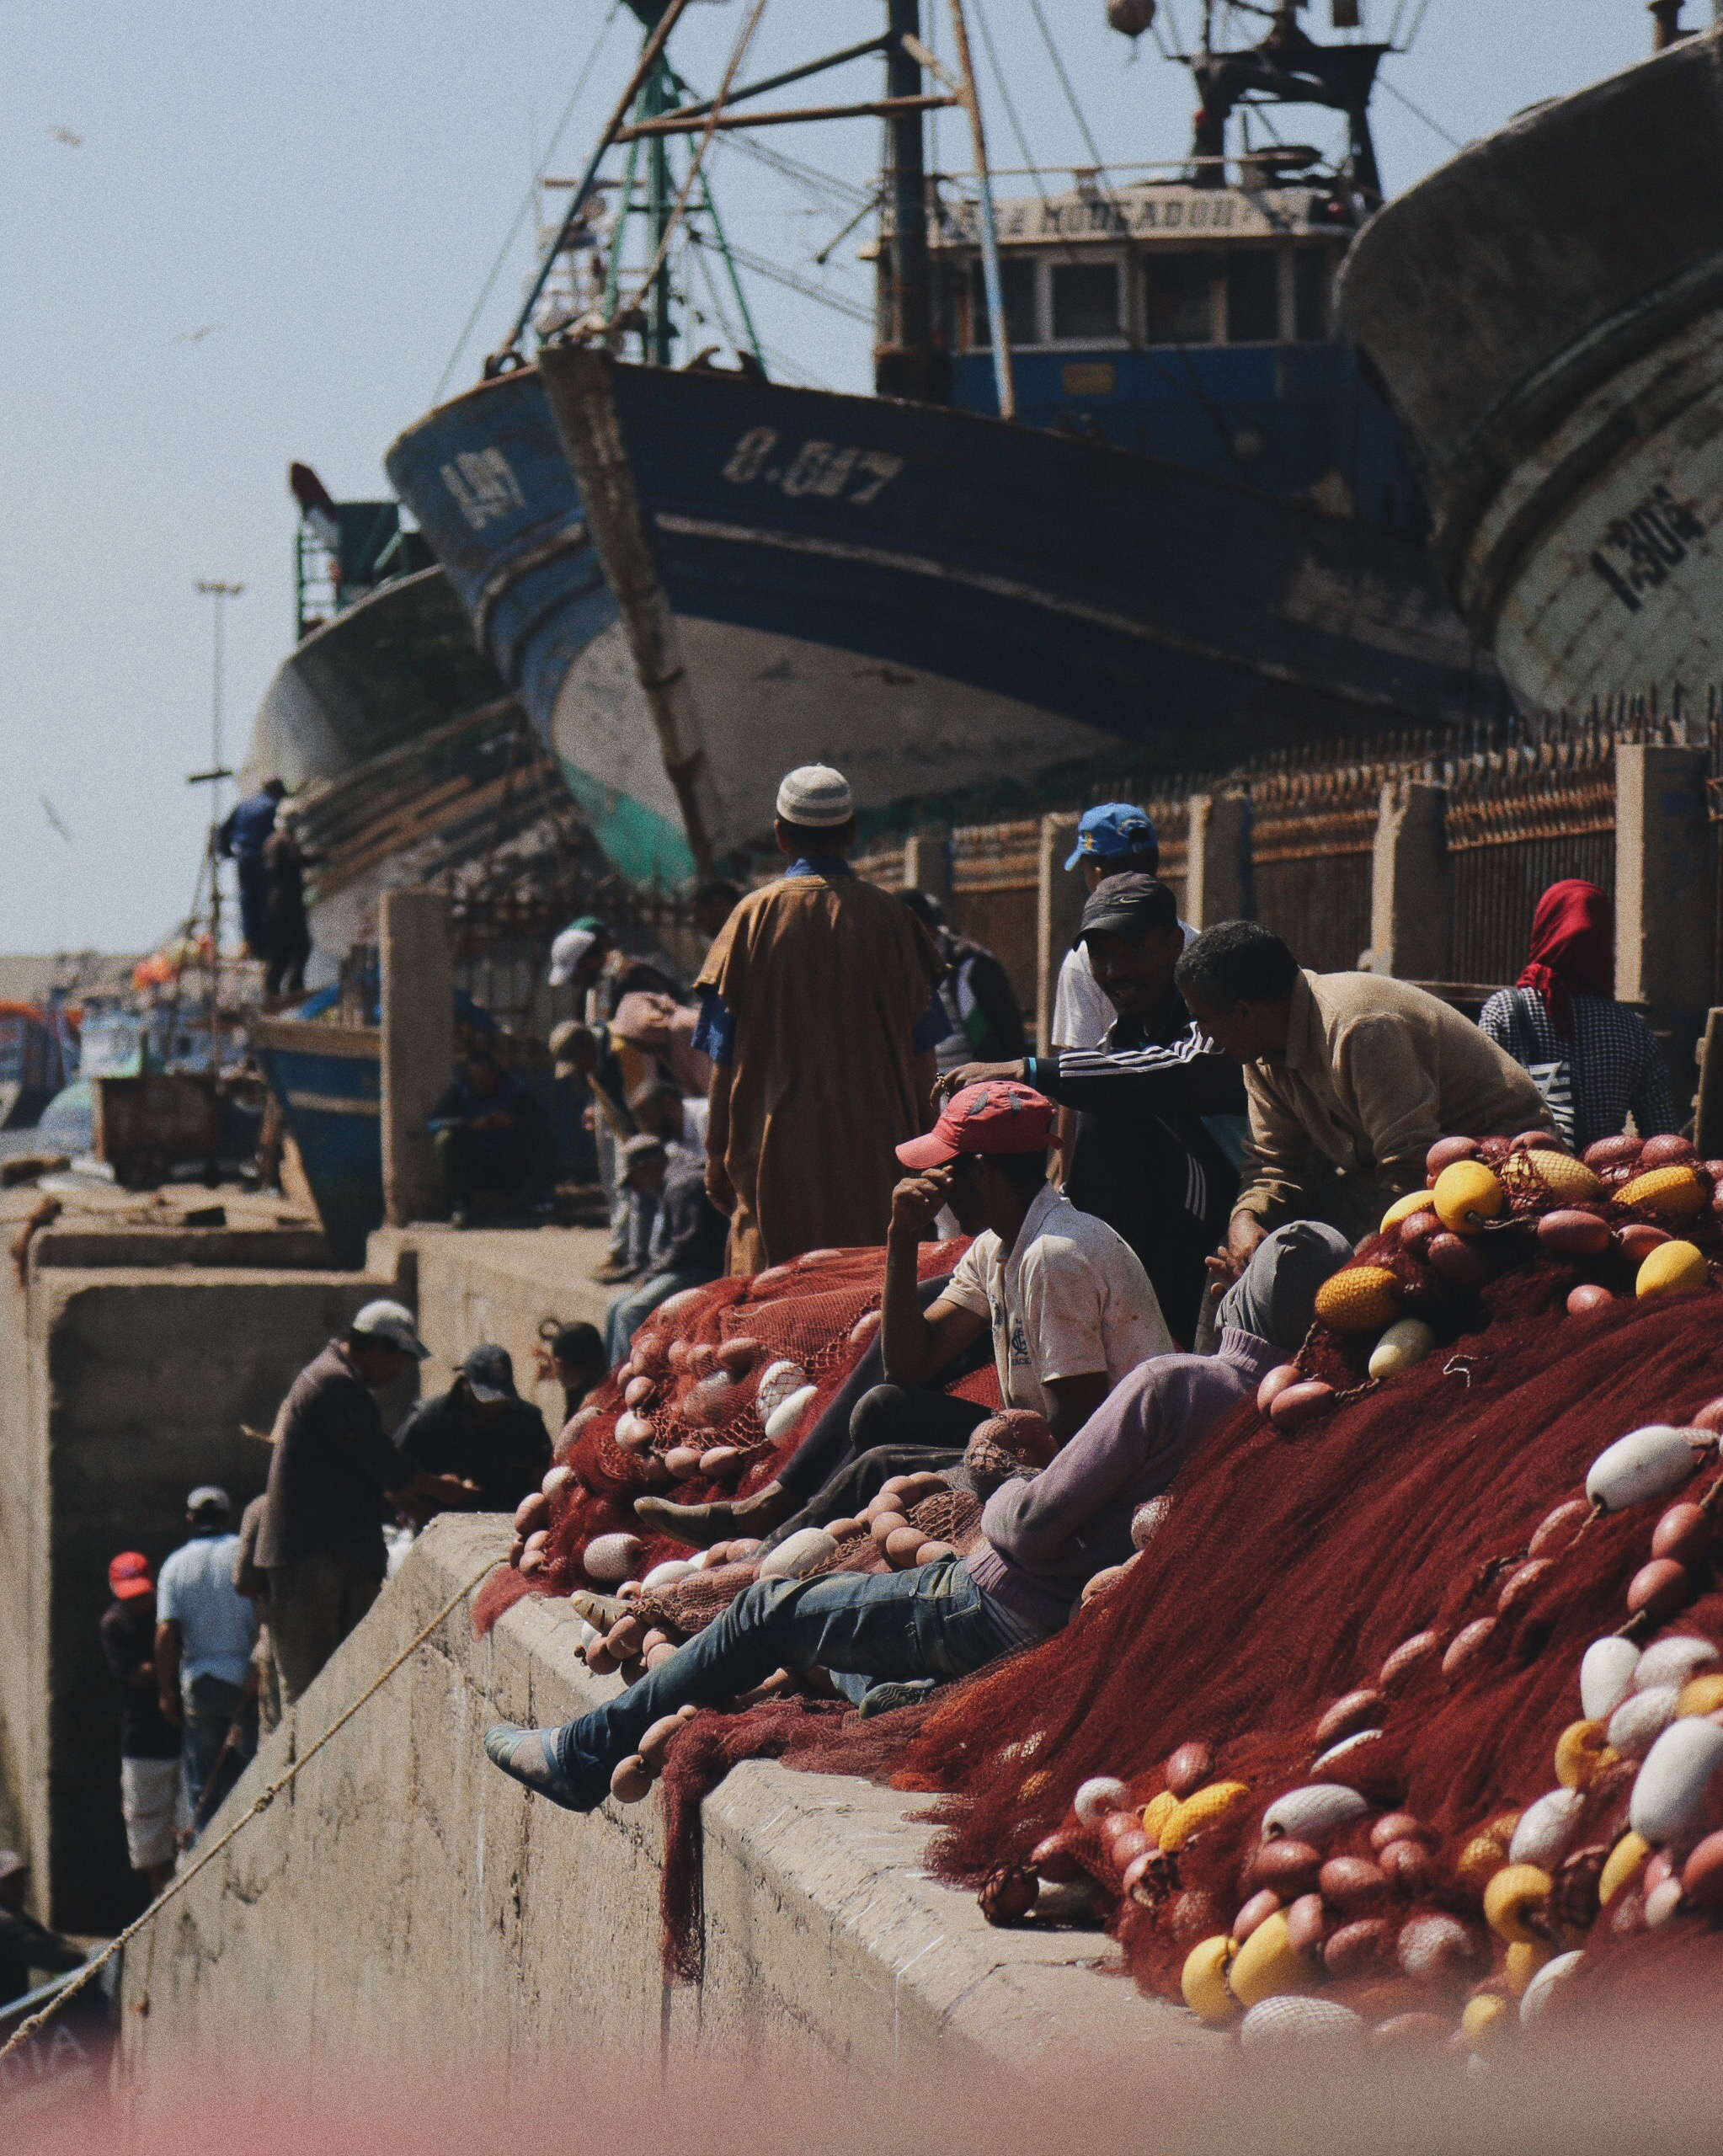 06-Essaouira-pejkovic.jpg